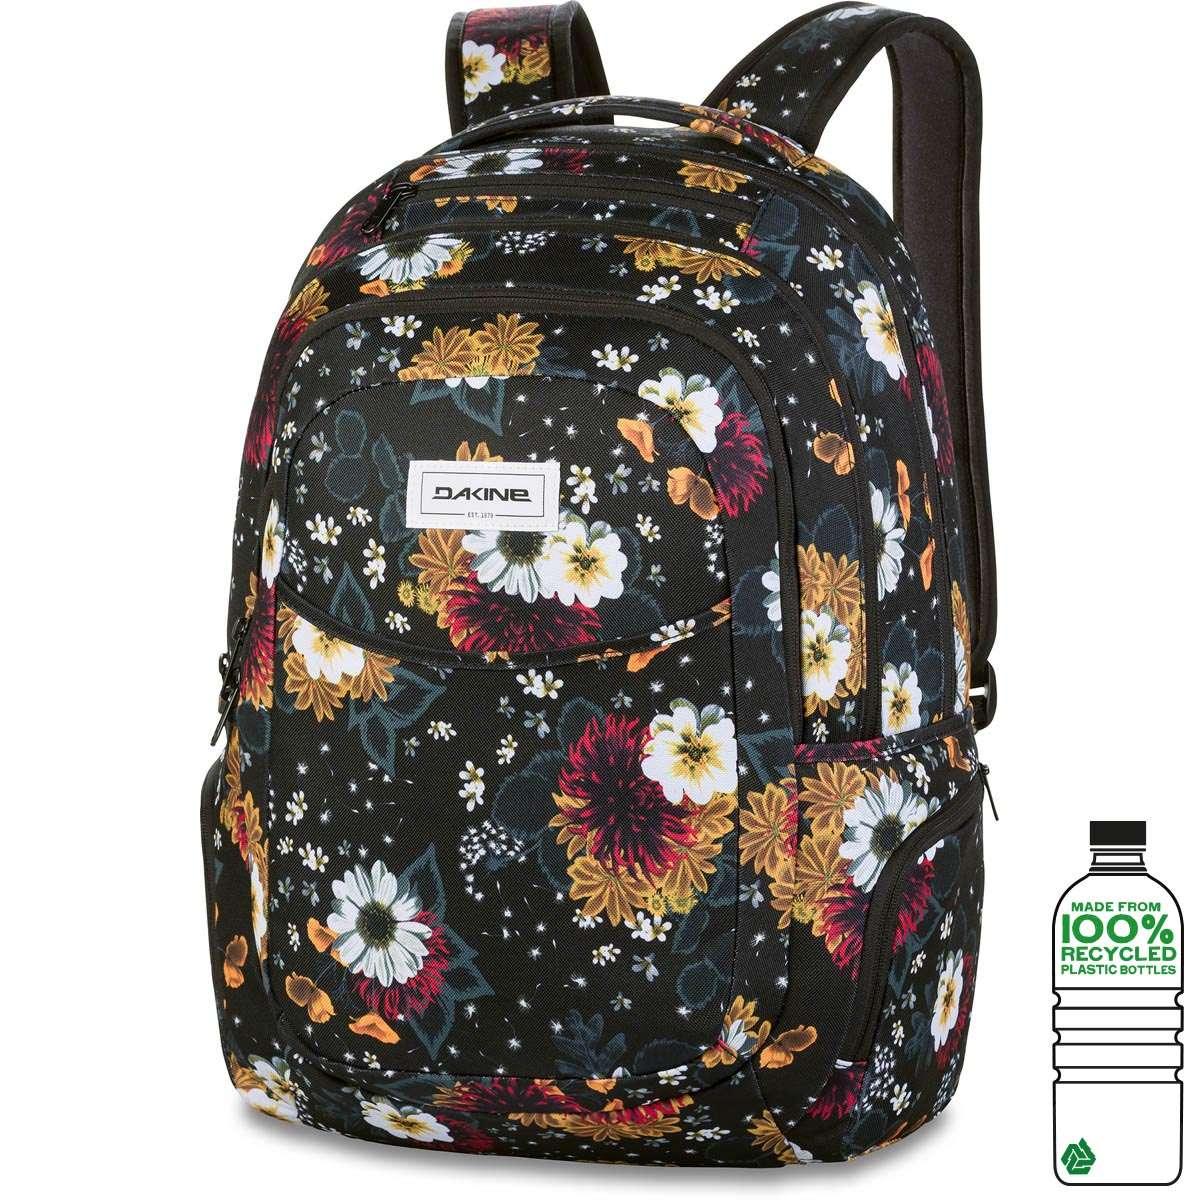 be0e01851537 Dakine Prom SR 27L Backpack Winter Daisy